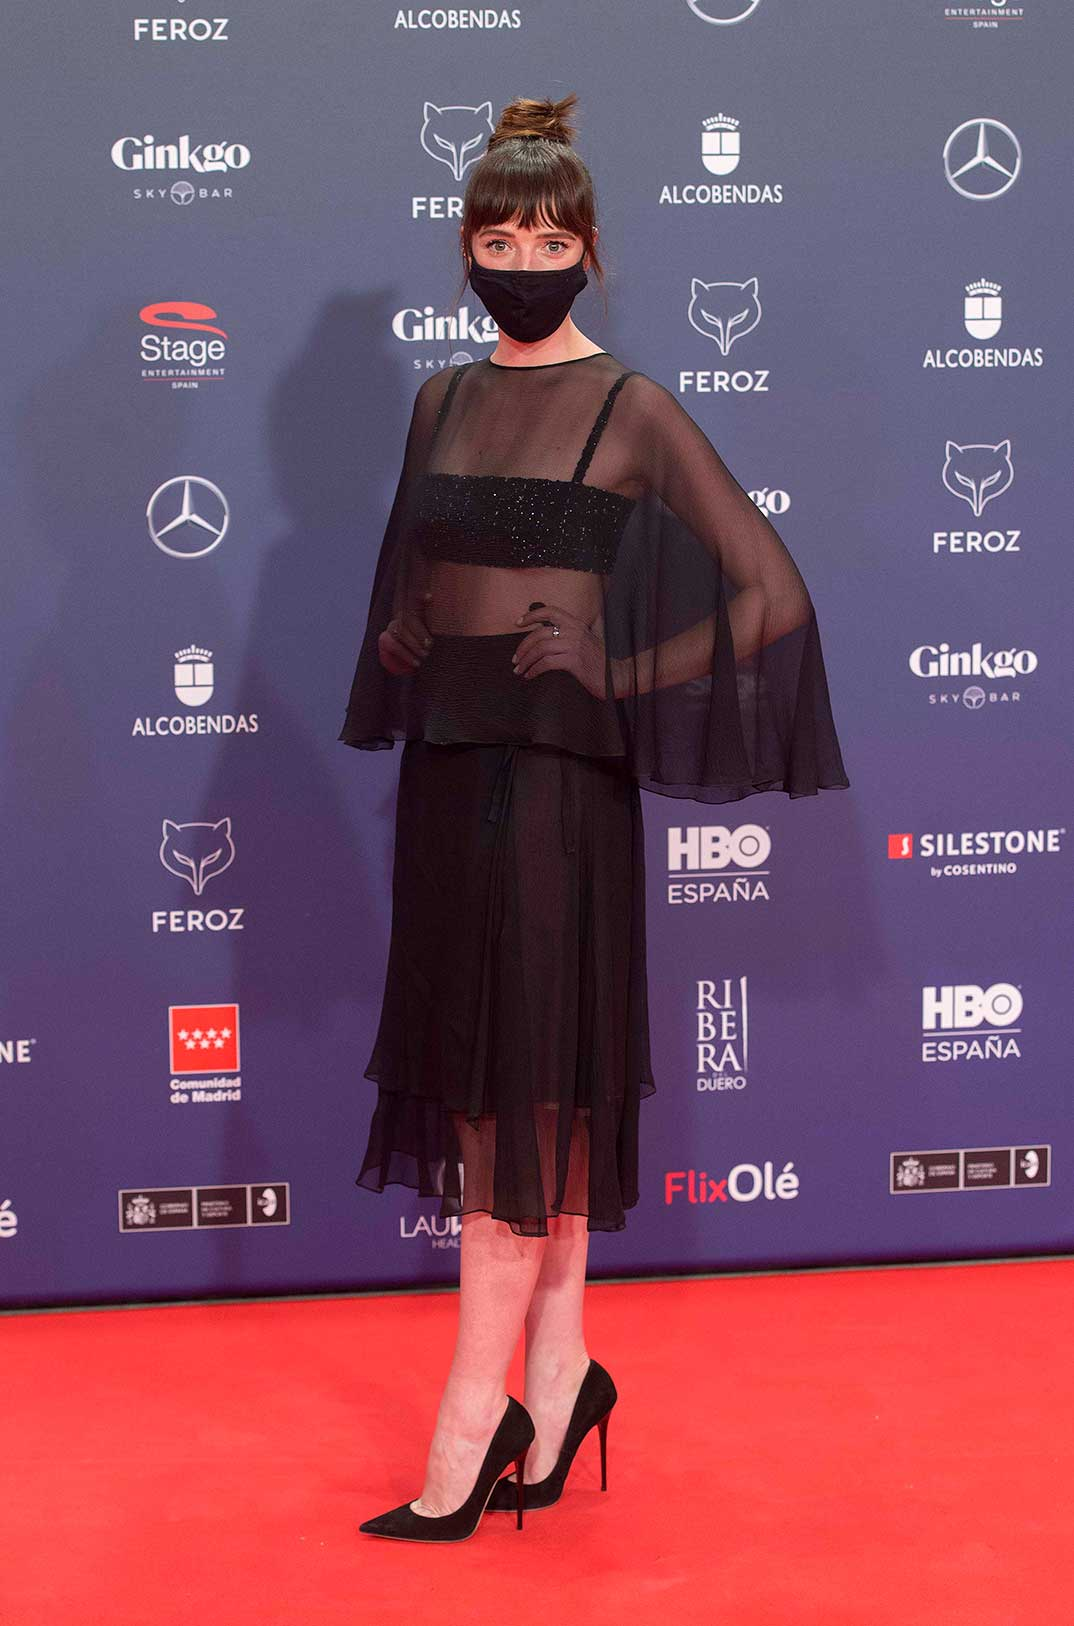 Susana Abaitua © Premios Feroz/Alberto Ortega